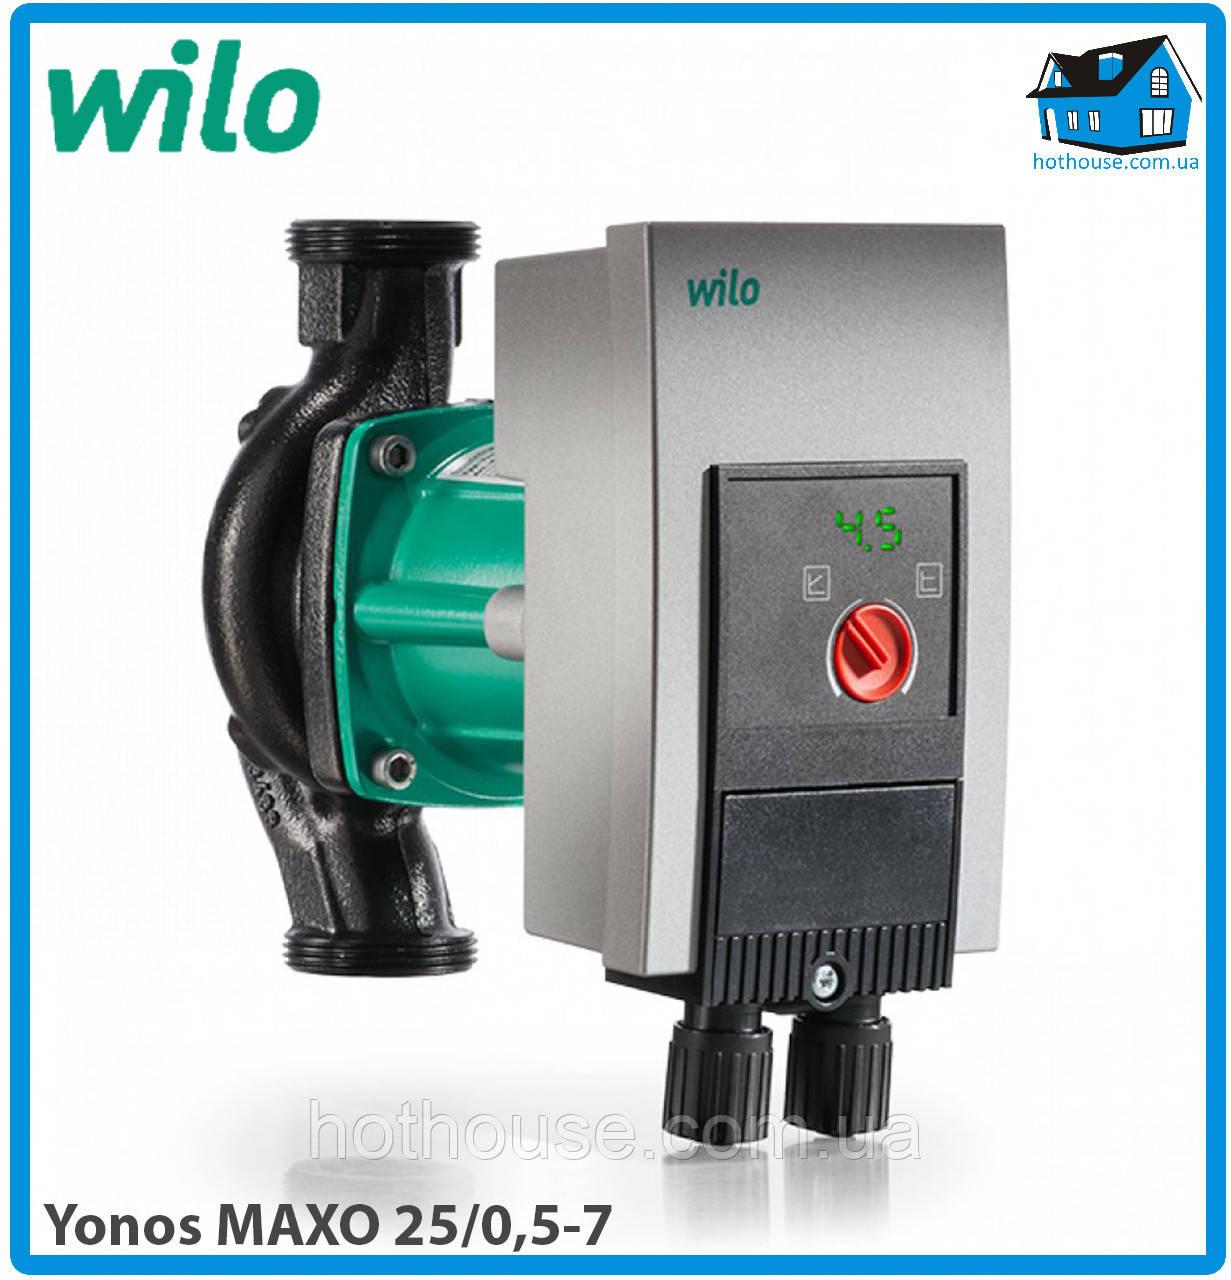 Насос циркуляционный Wilo Yonos MAXO 25/0,5-7 (оригинал)